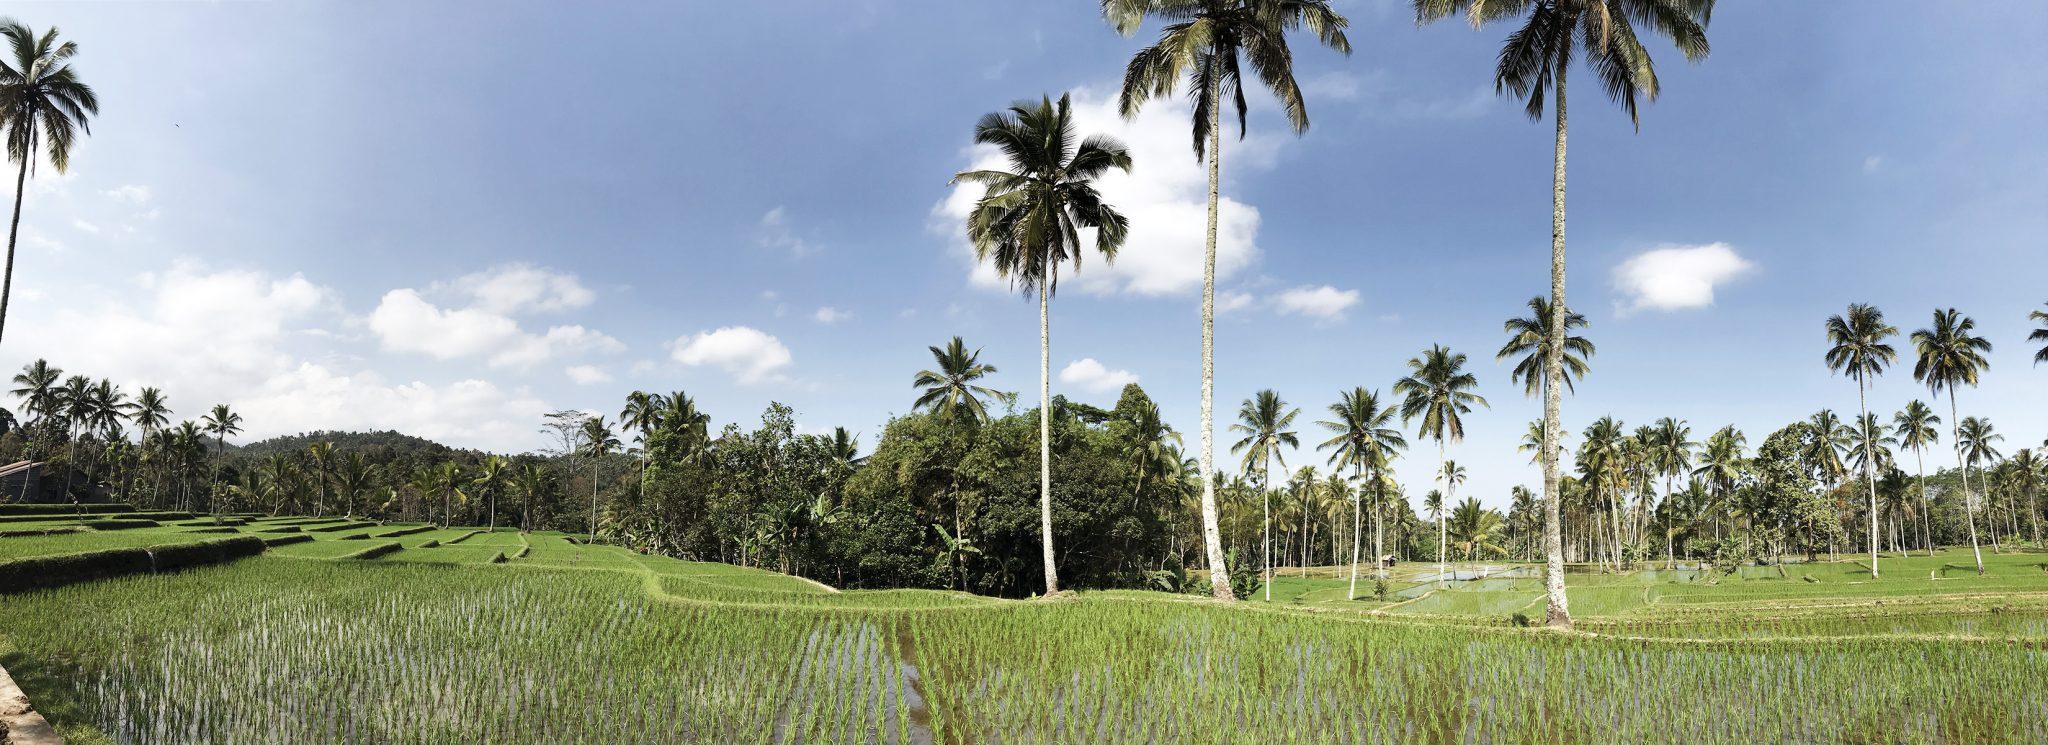 15 JAWA r1 - Jawa: wulkan Ijen, Bromo, Yogyakarta i świątynie